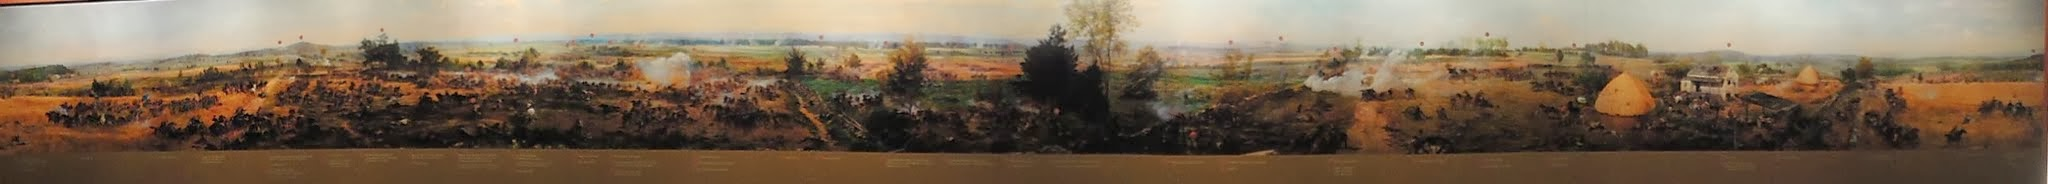 Photo: Gettysburg Visitor Center - Cyclorama - Panorama of the Gettysburg Battlefield